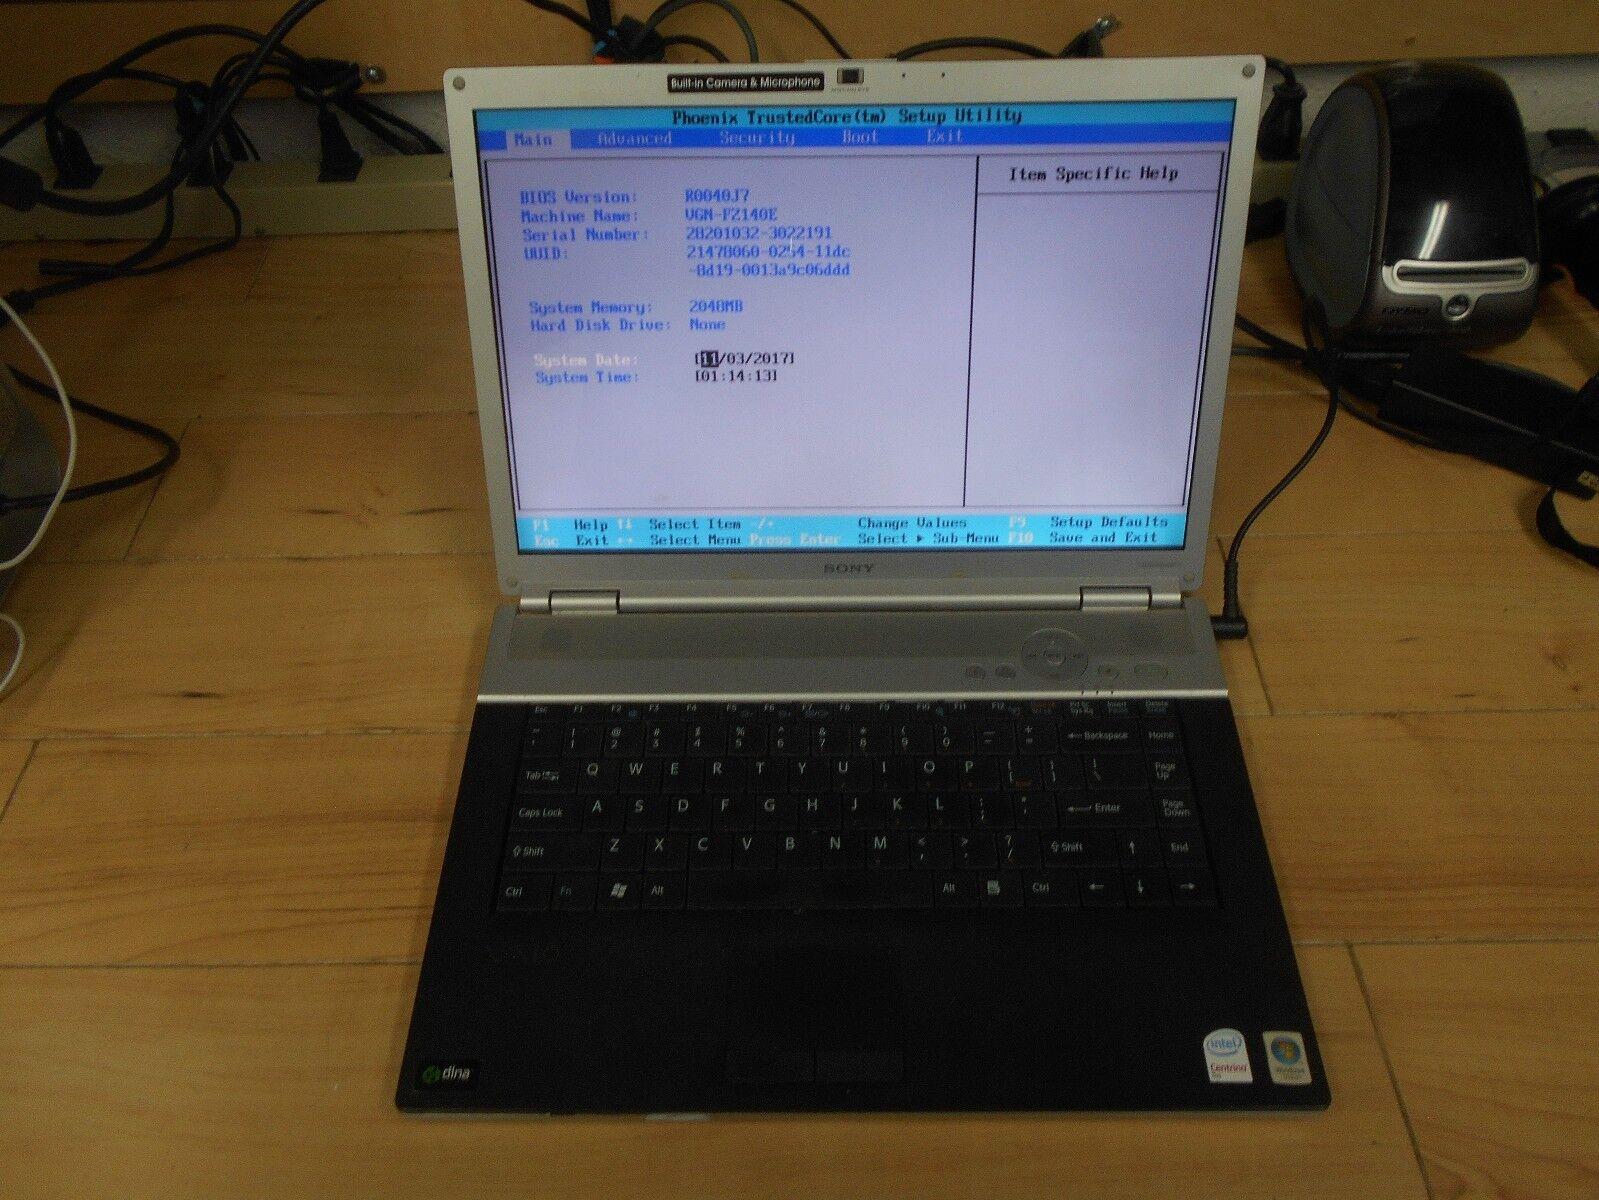 Sony Vaio VPCEE31FX Hitachi ODD Windows 8